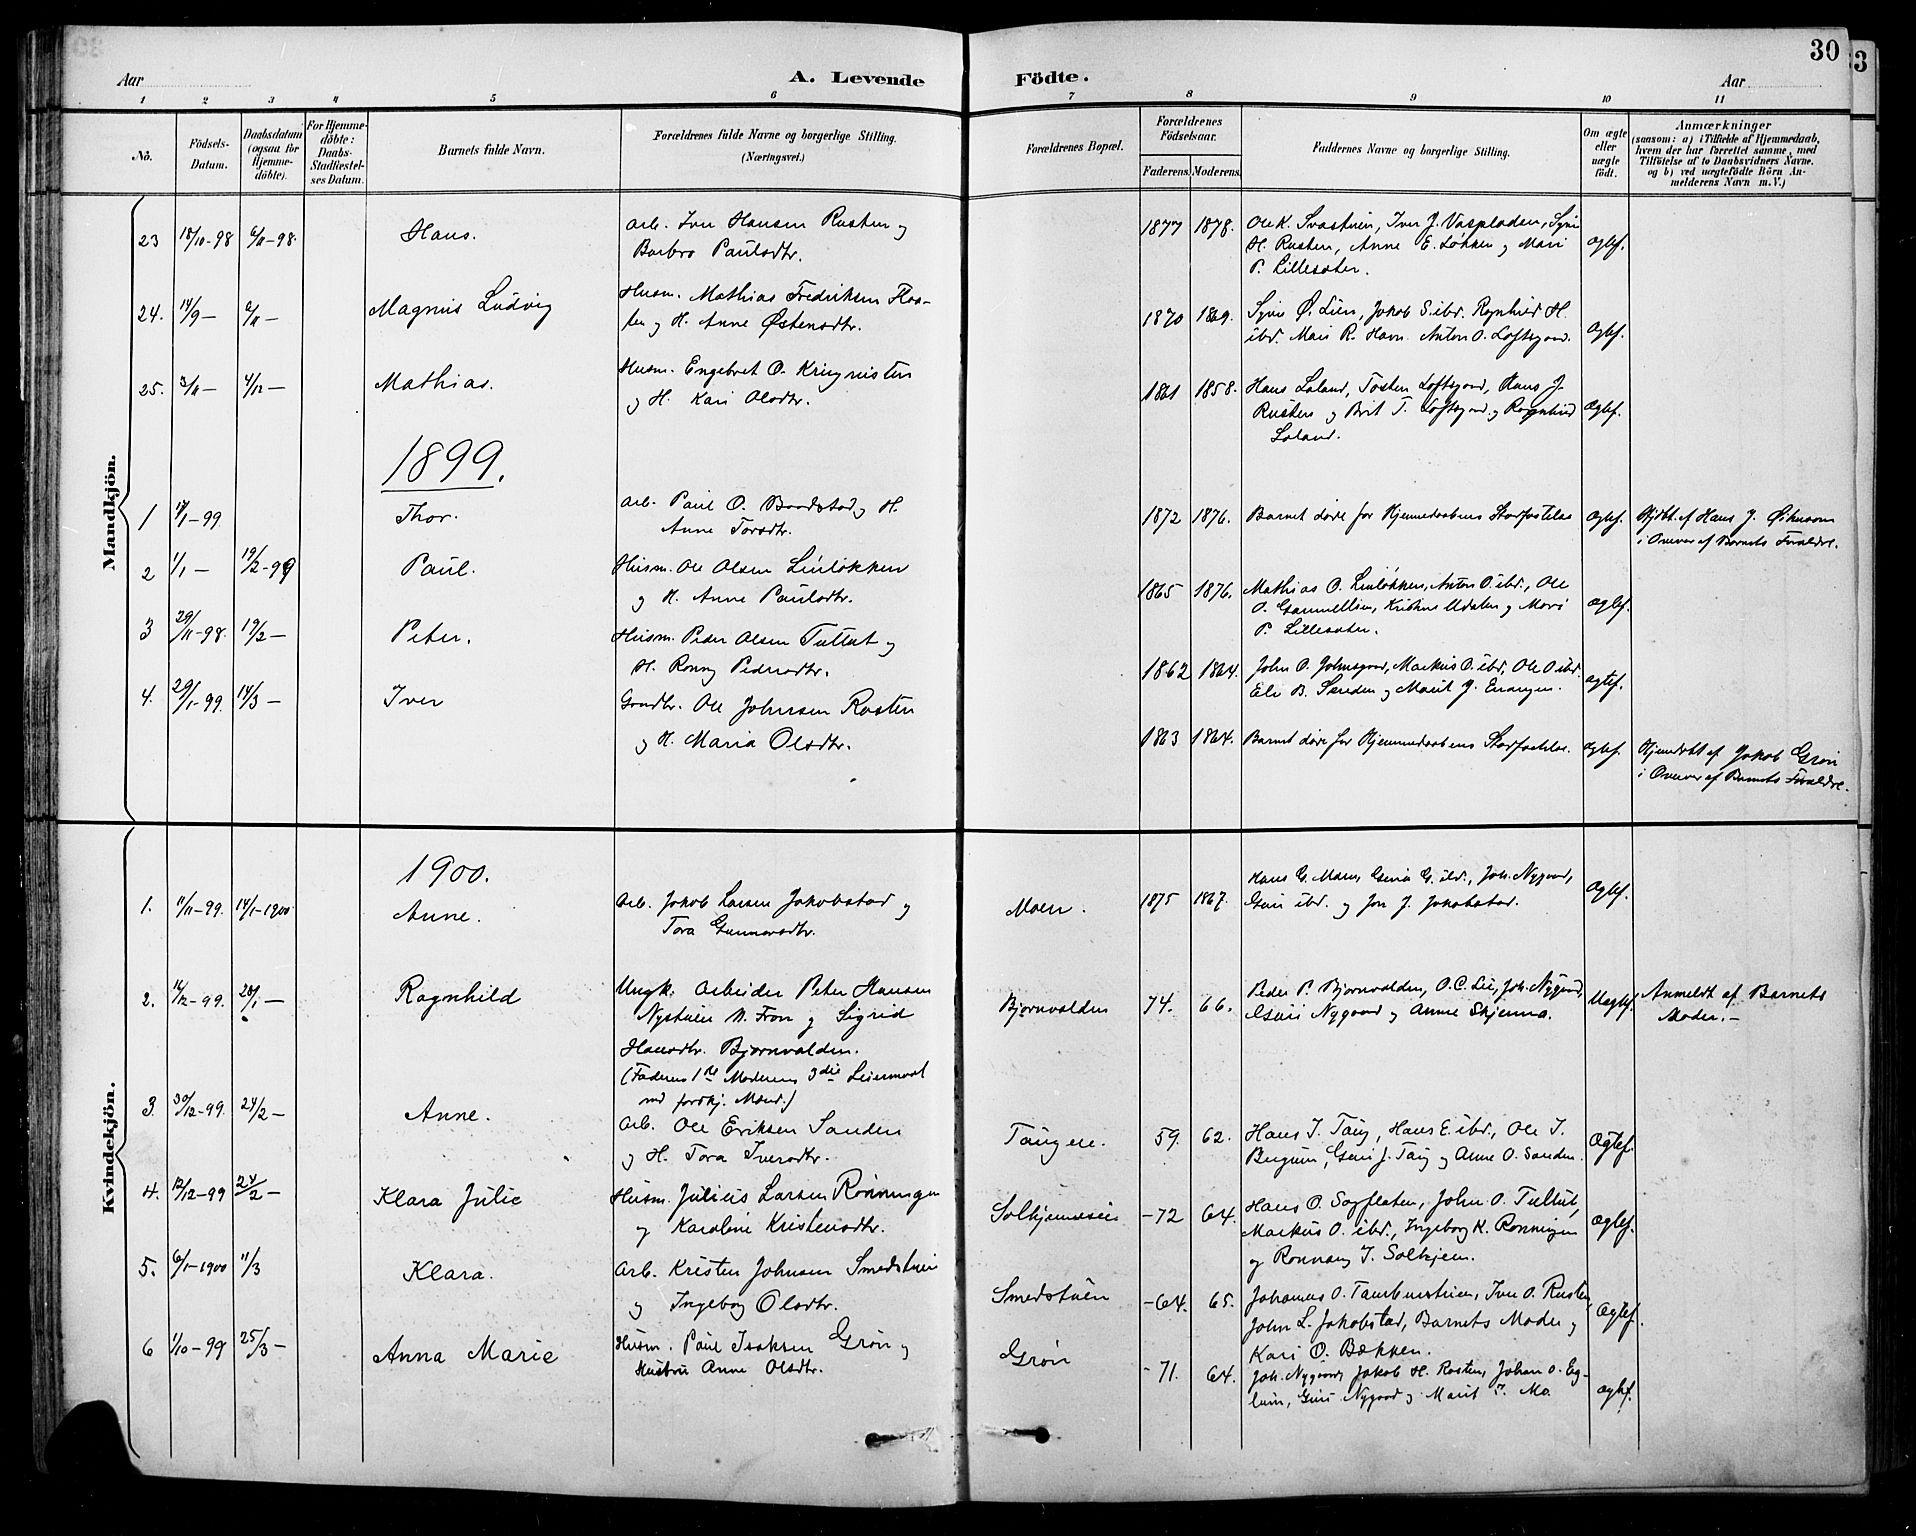 SAH, Sel prestekontor, Klokkerbok nr. 1, 1894-1923, s. 30